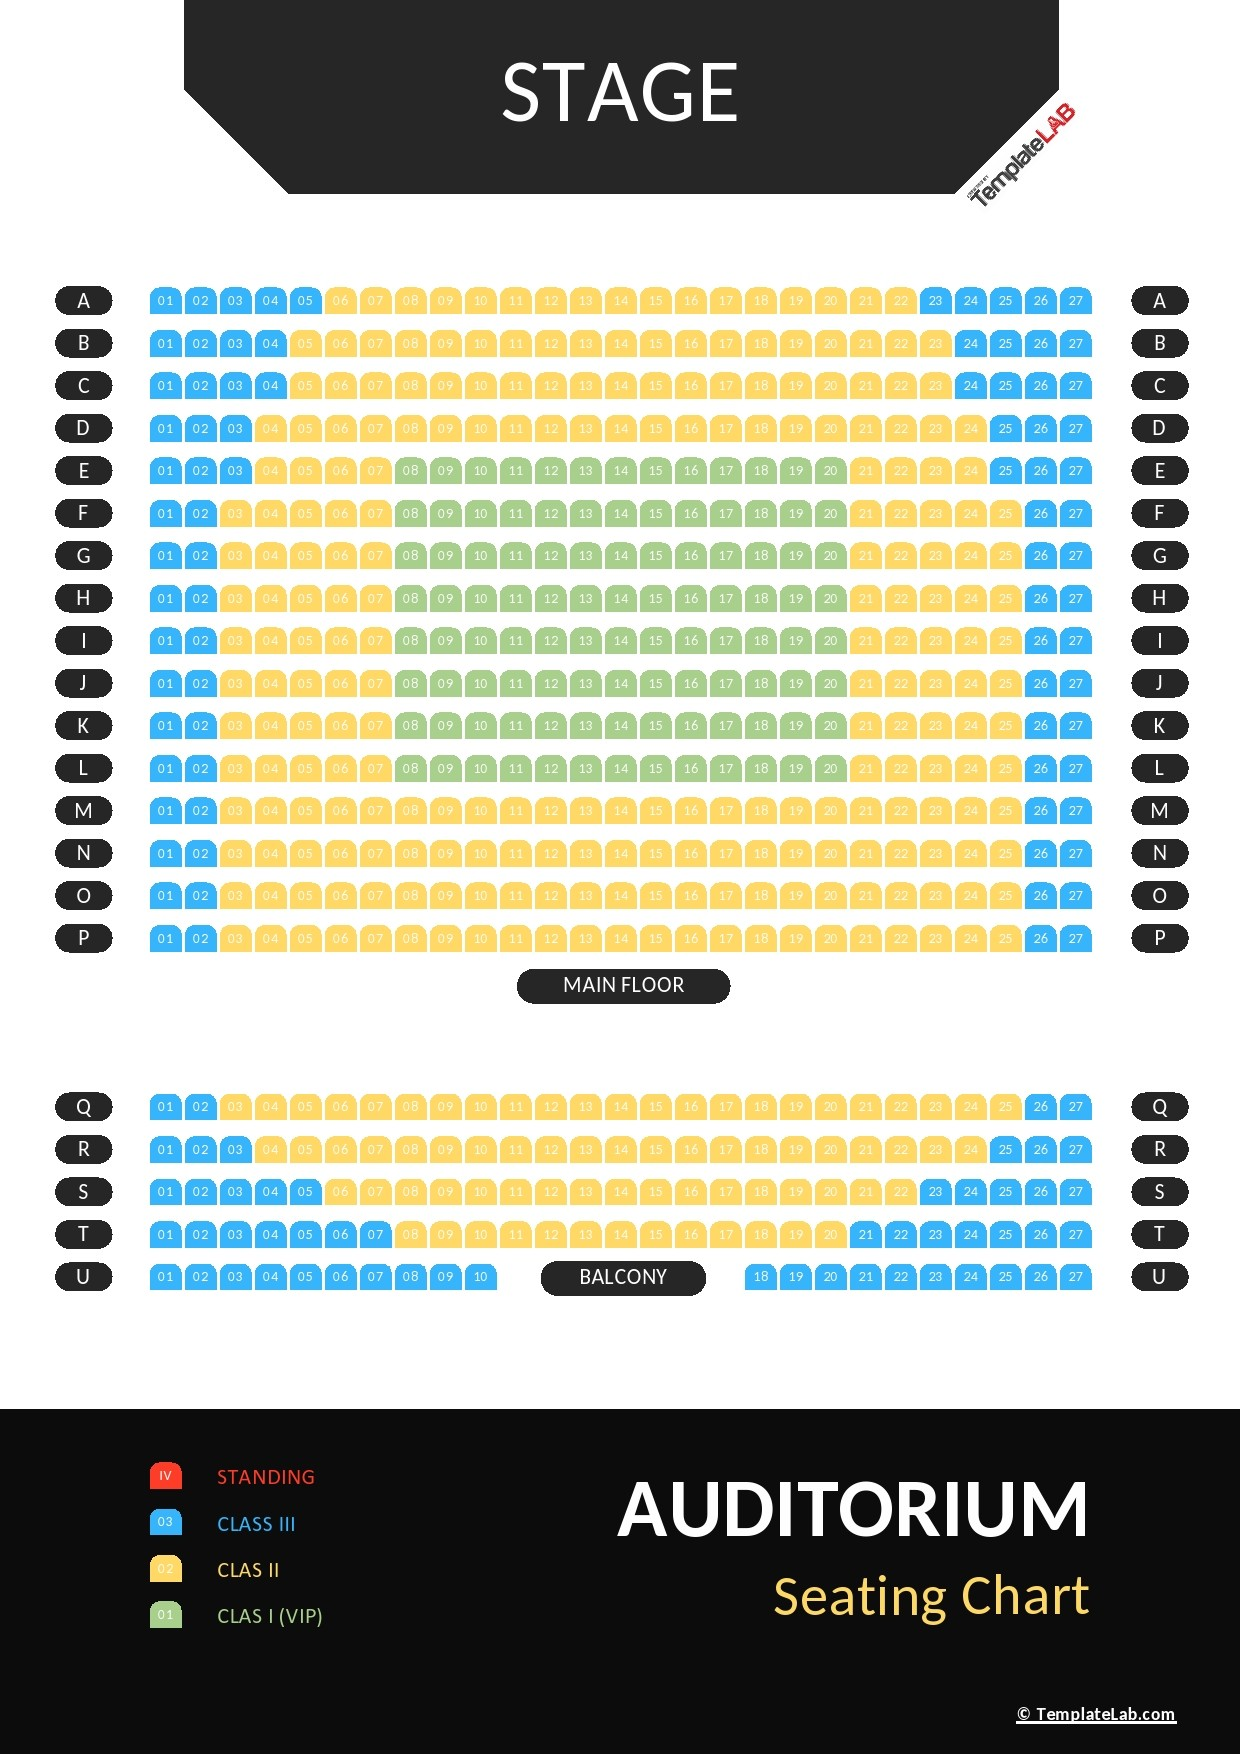 Free Auditorium Seating Chart Template - TemplateLab.com